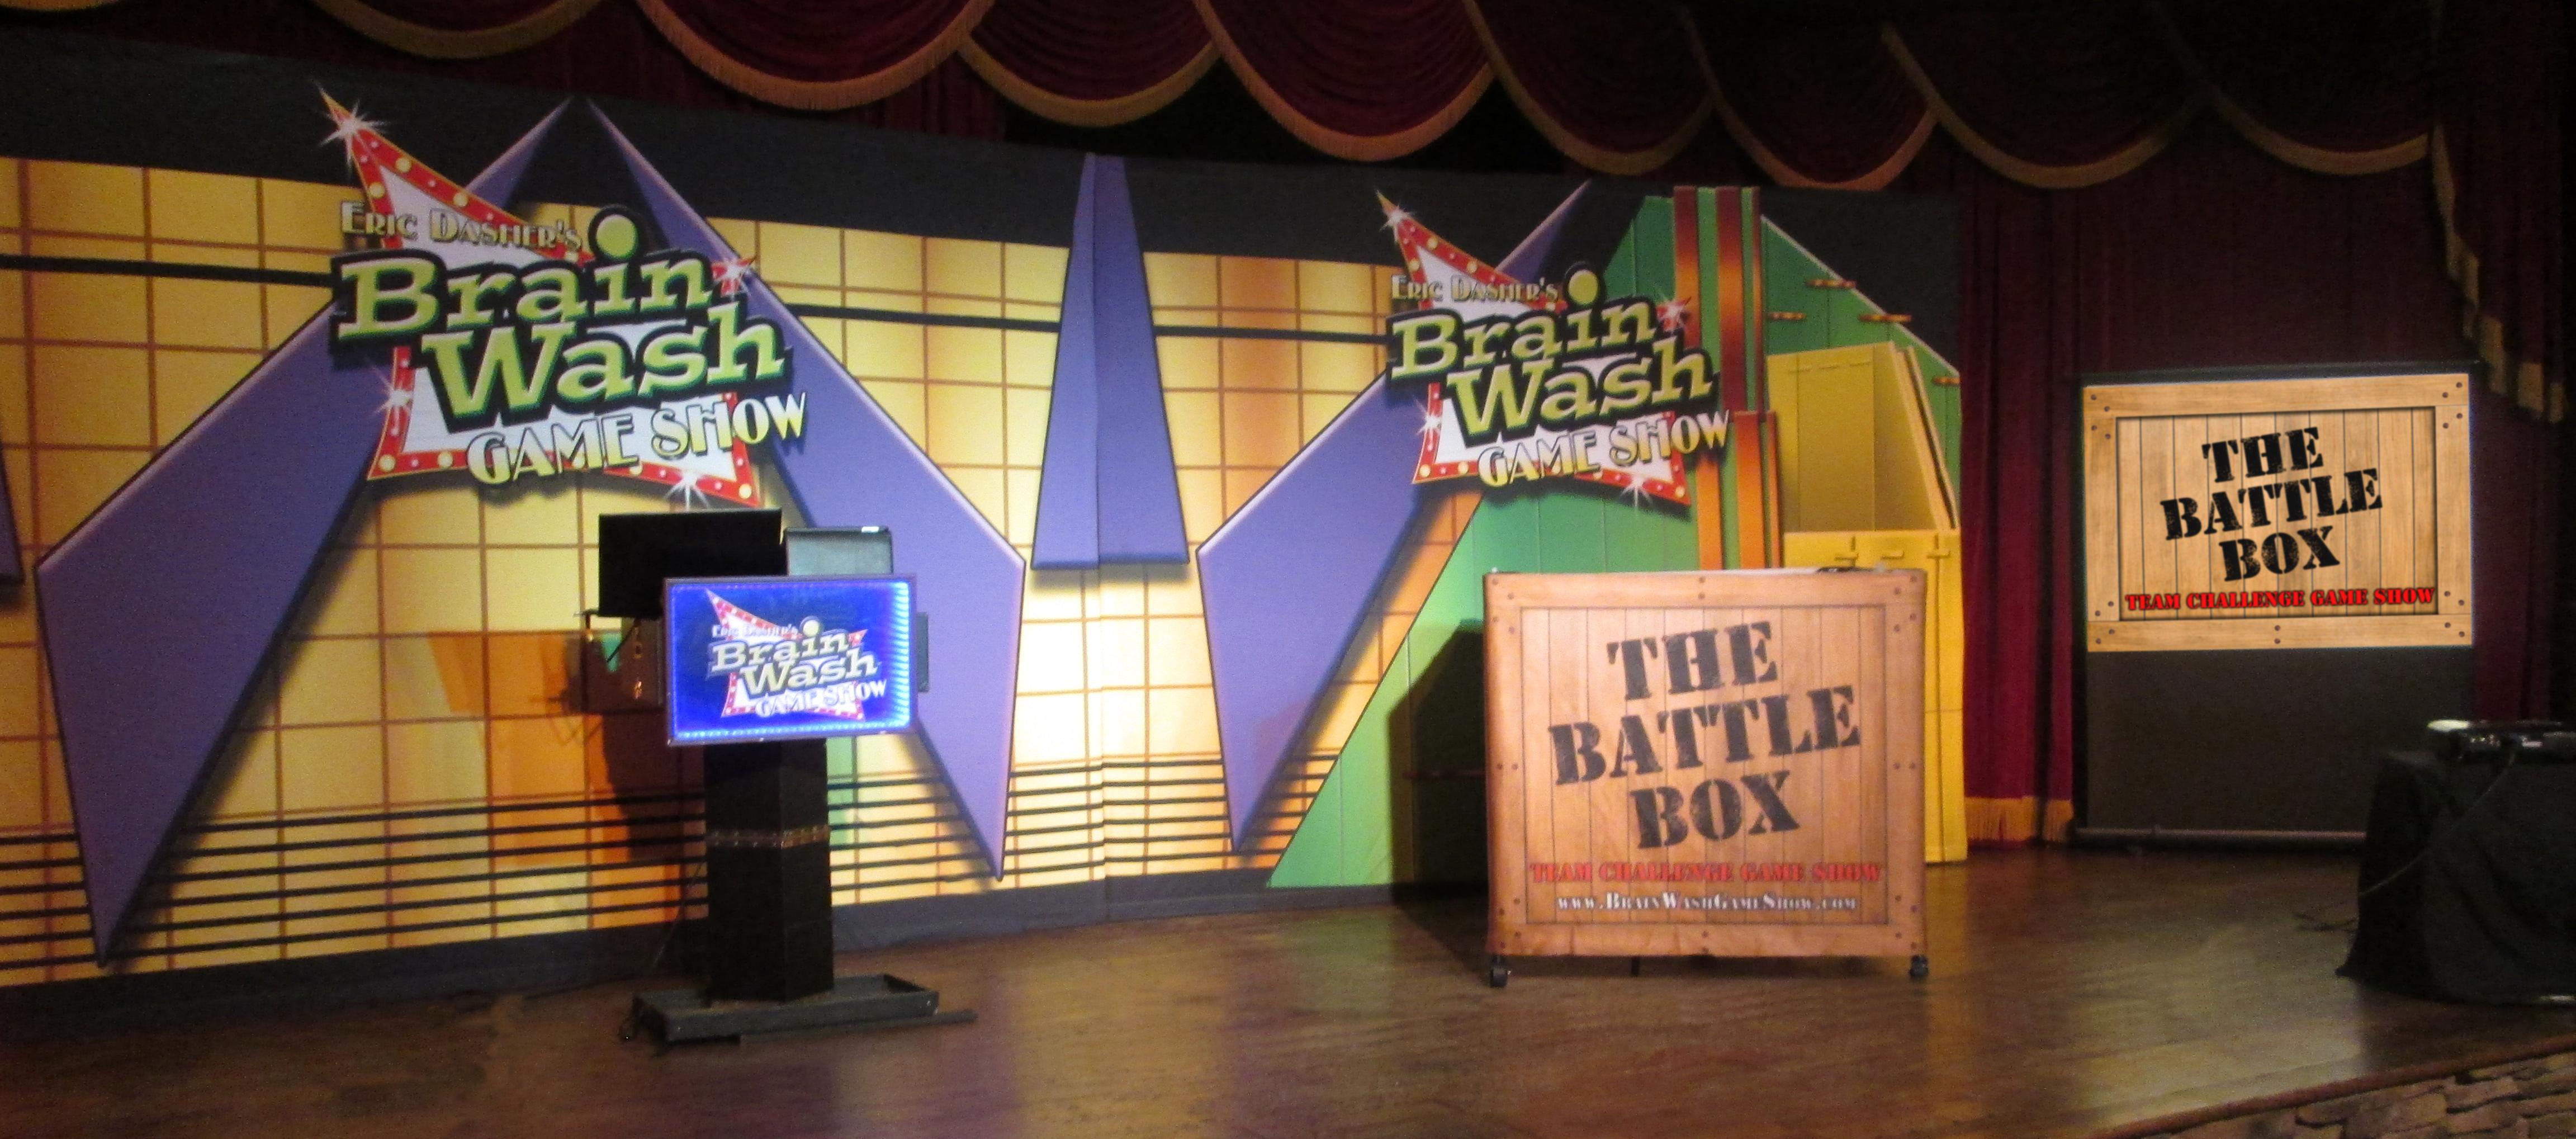 Battle Box 4